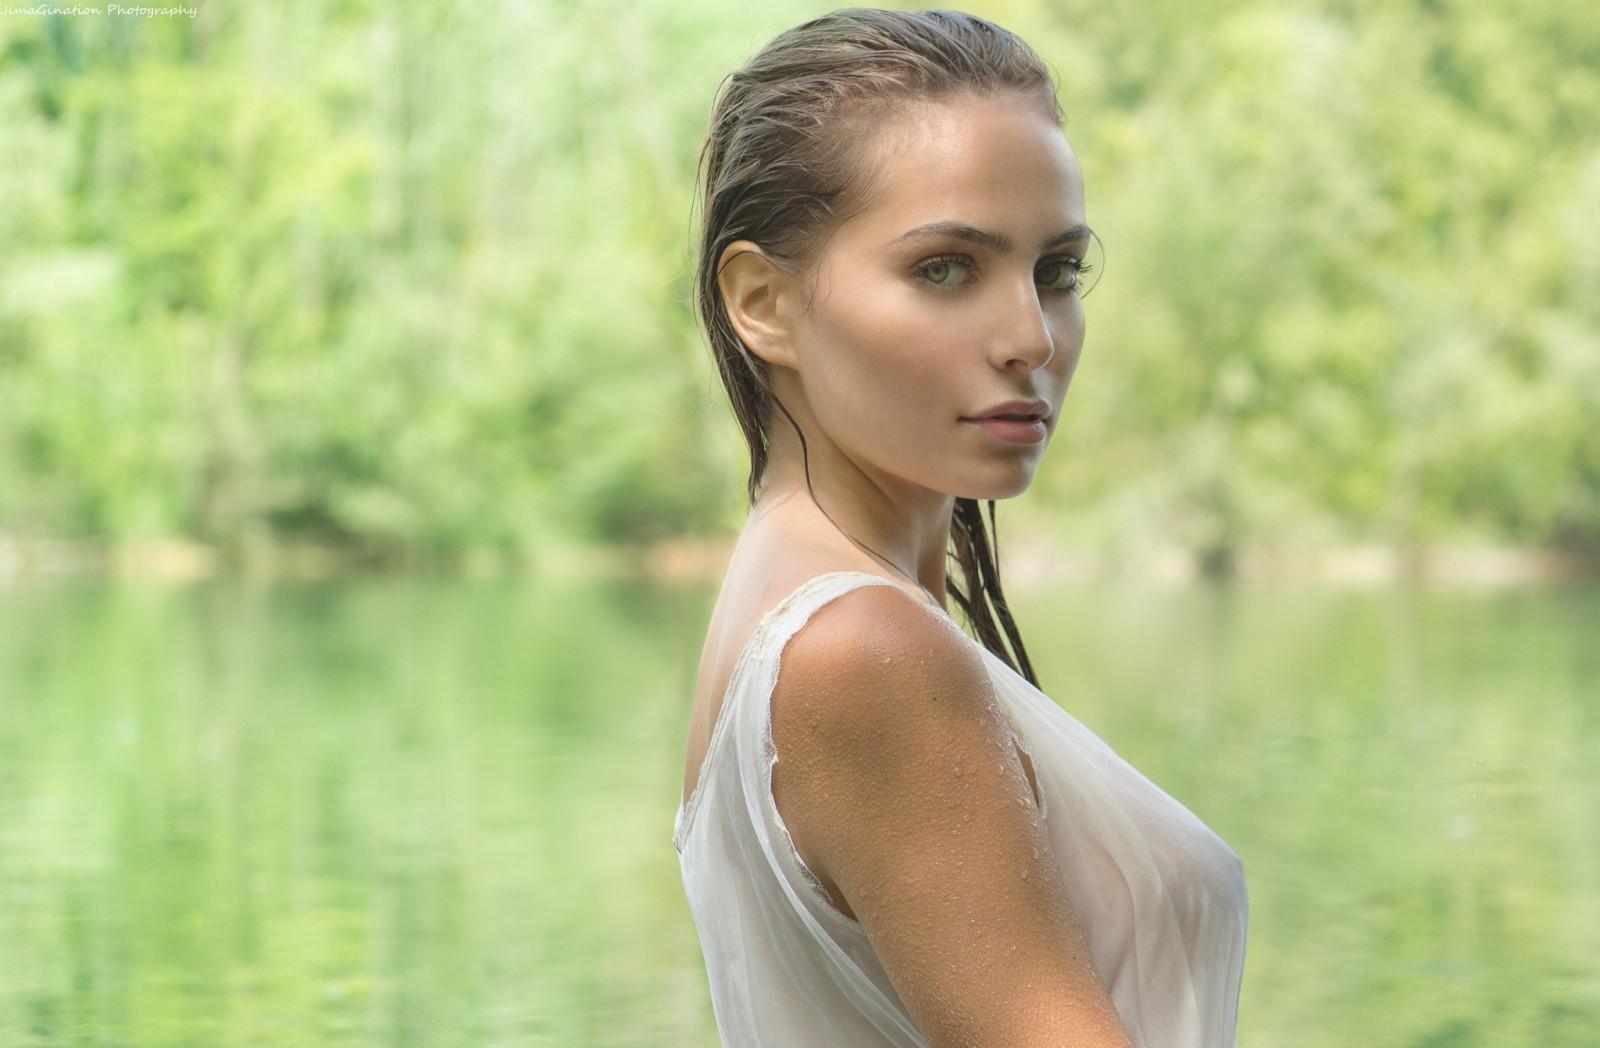 Wallpaper : women outdoors, model, wet clothing, wet hair